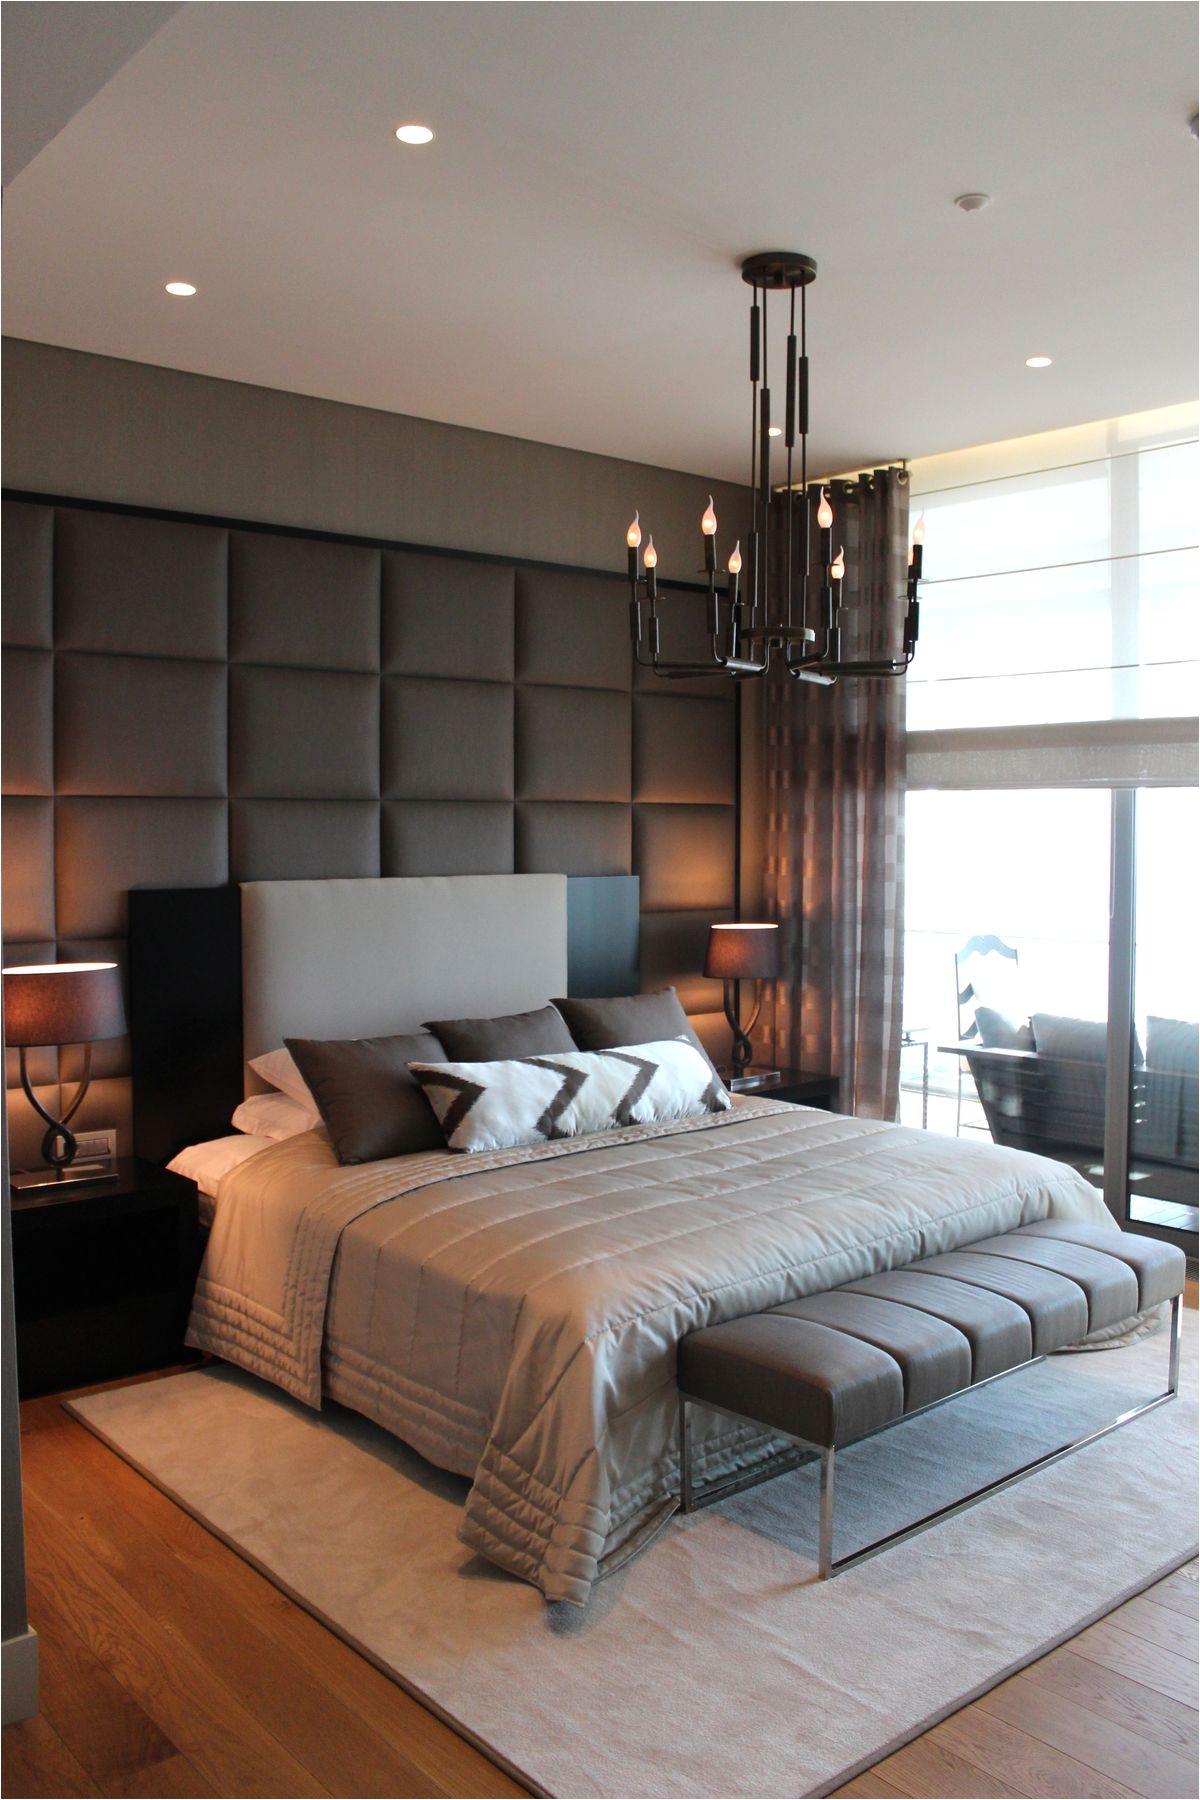 Master Bedroom Art Ideas Media Cache Ec0 Pinimg 1200x 03 01 0d